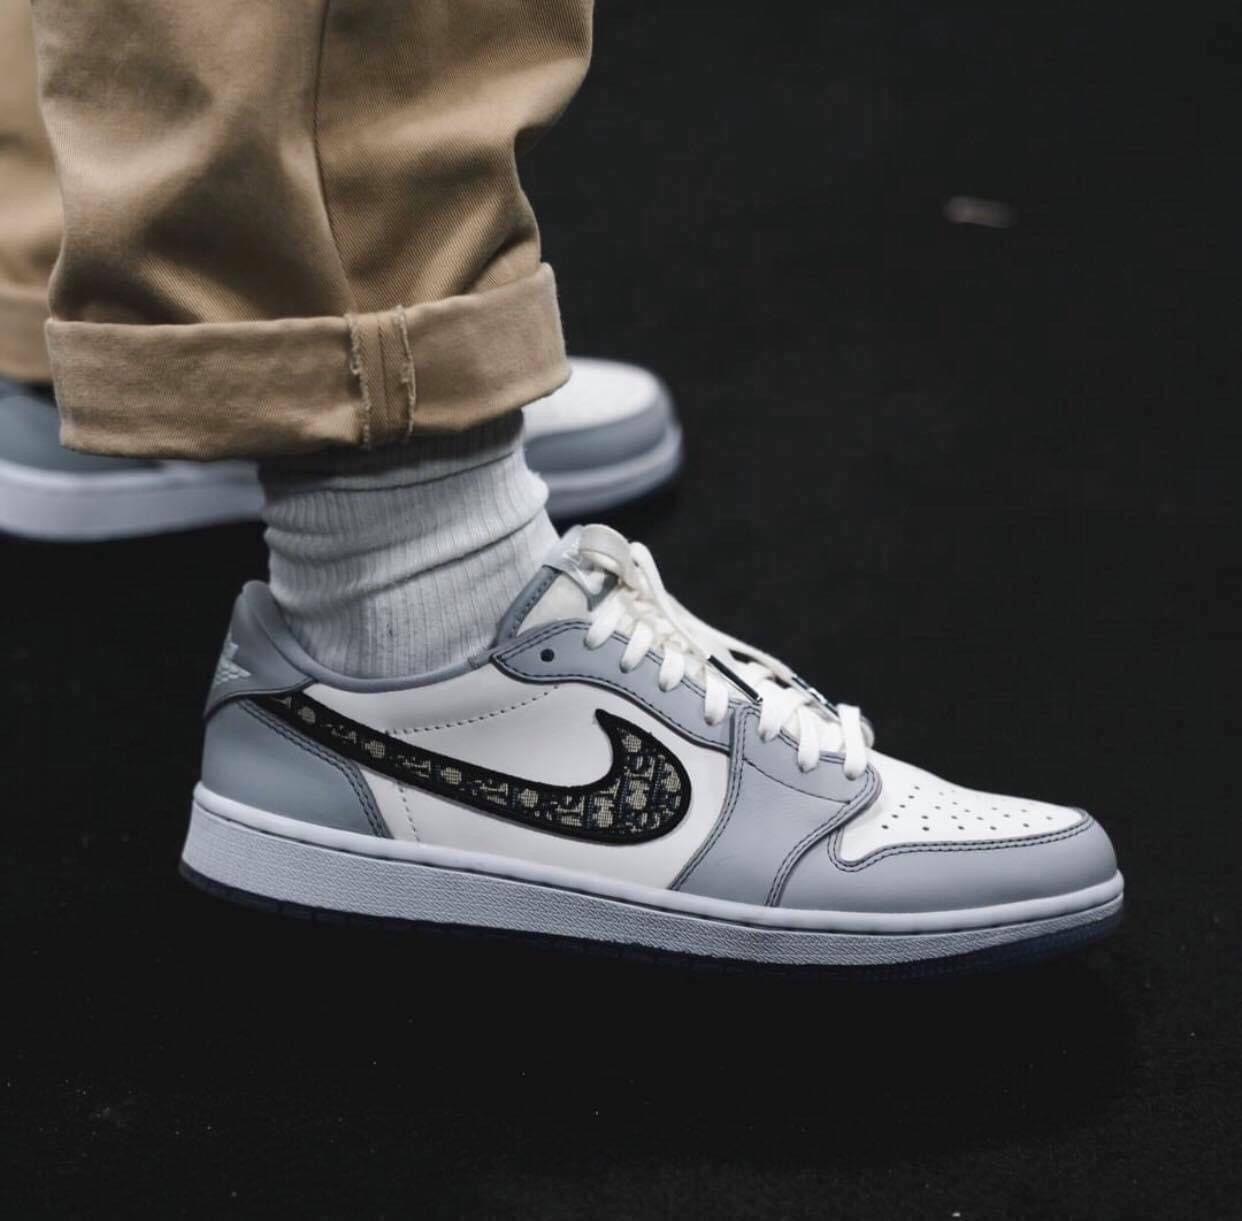 Dior x Air Jordan 1 Collections   Nike casual shoes, Nike fashion ...